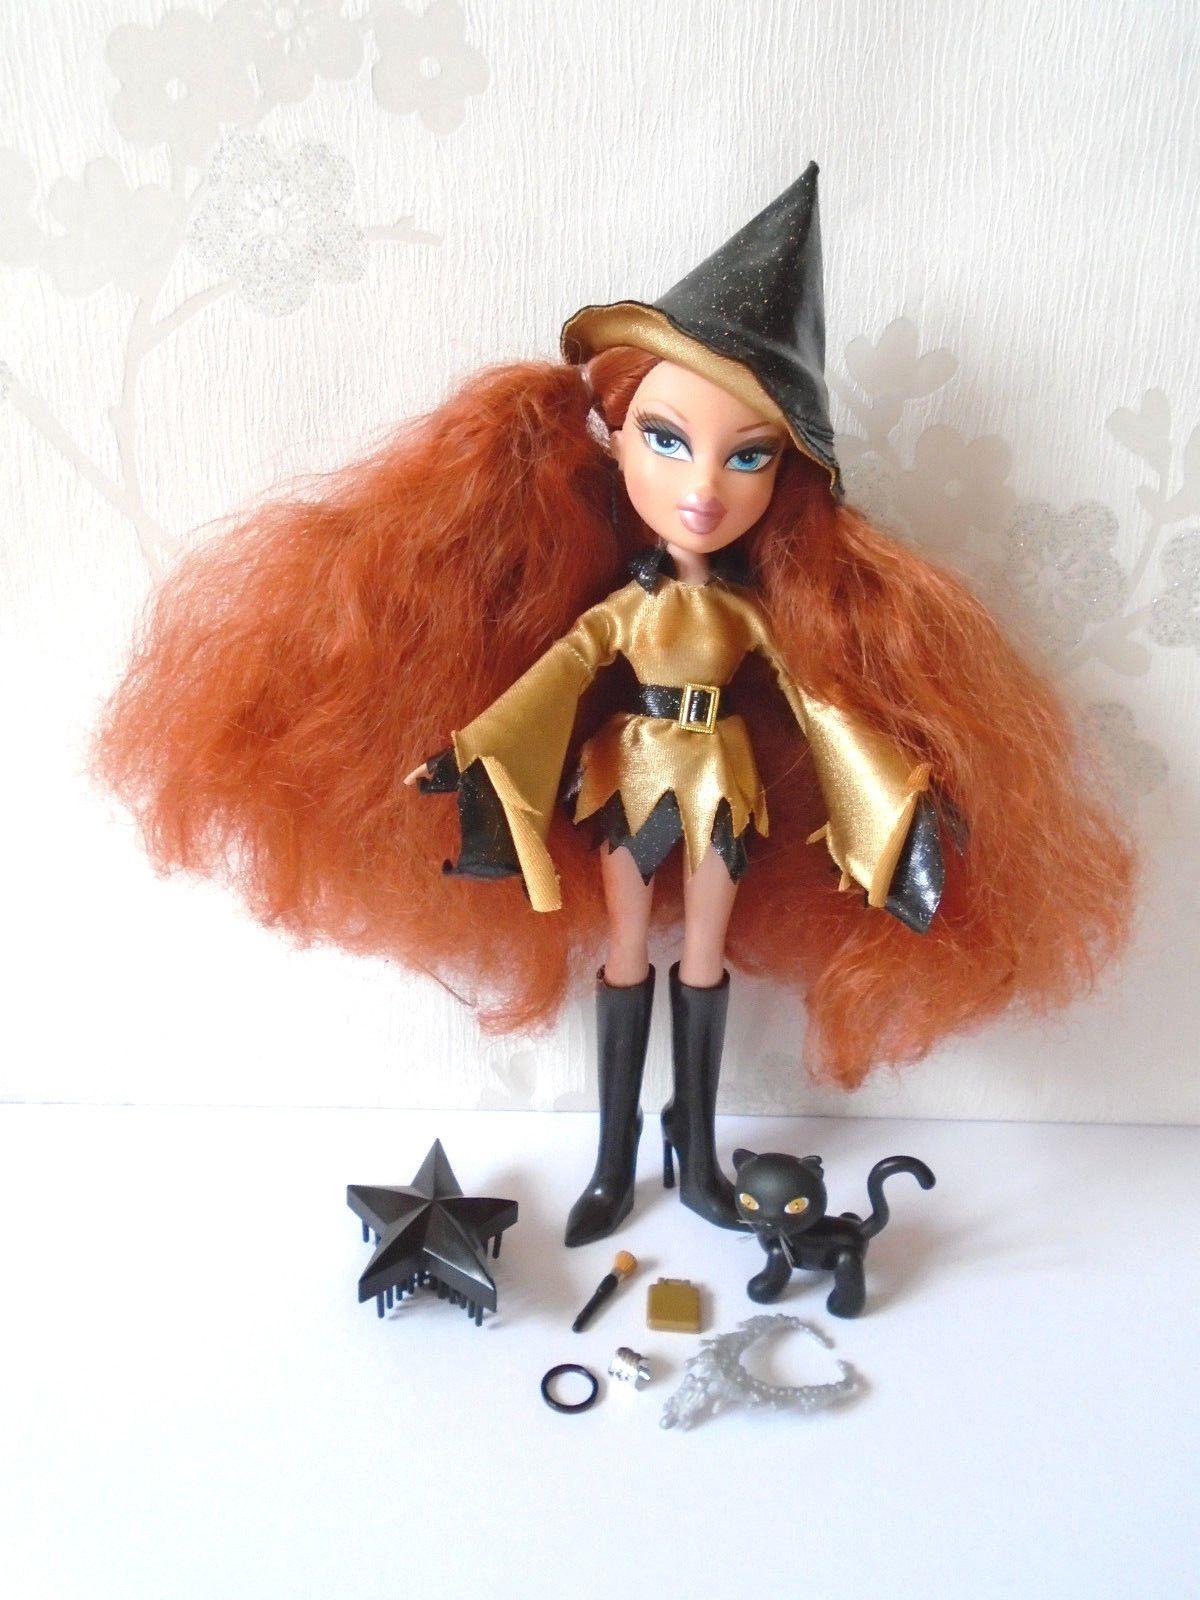 Lalki i akcesoria Bratz Doll Clothes Meygan's Original